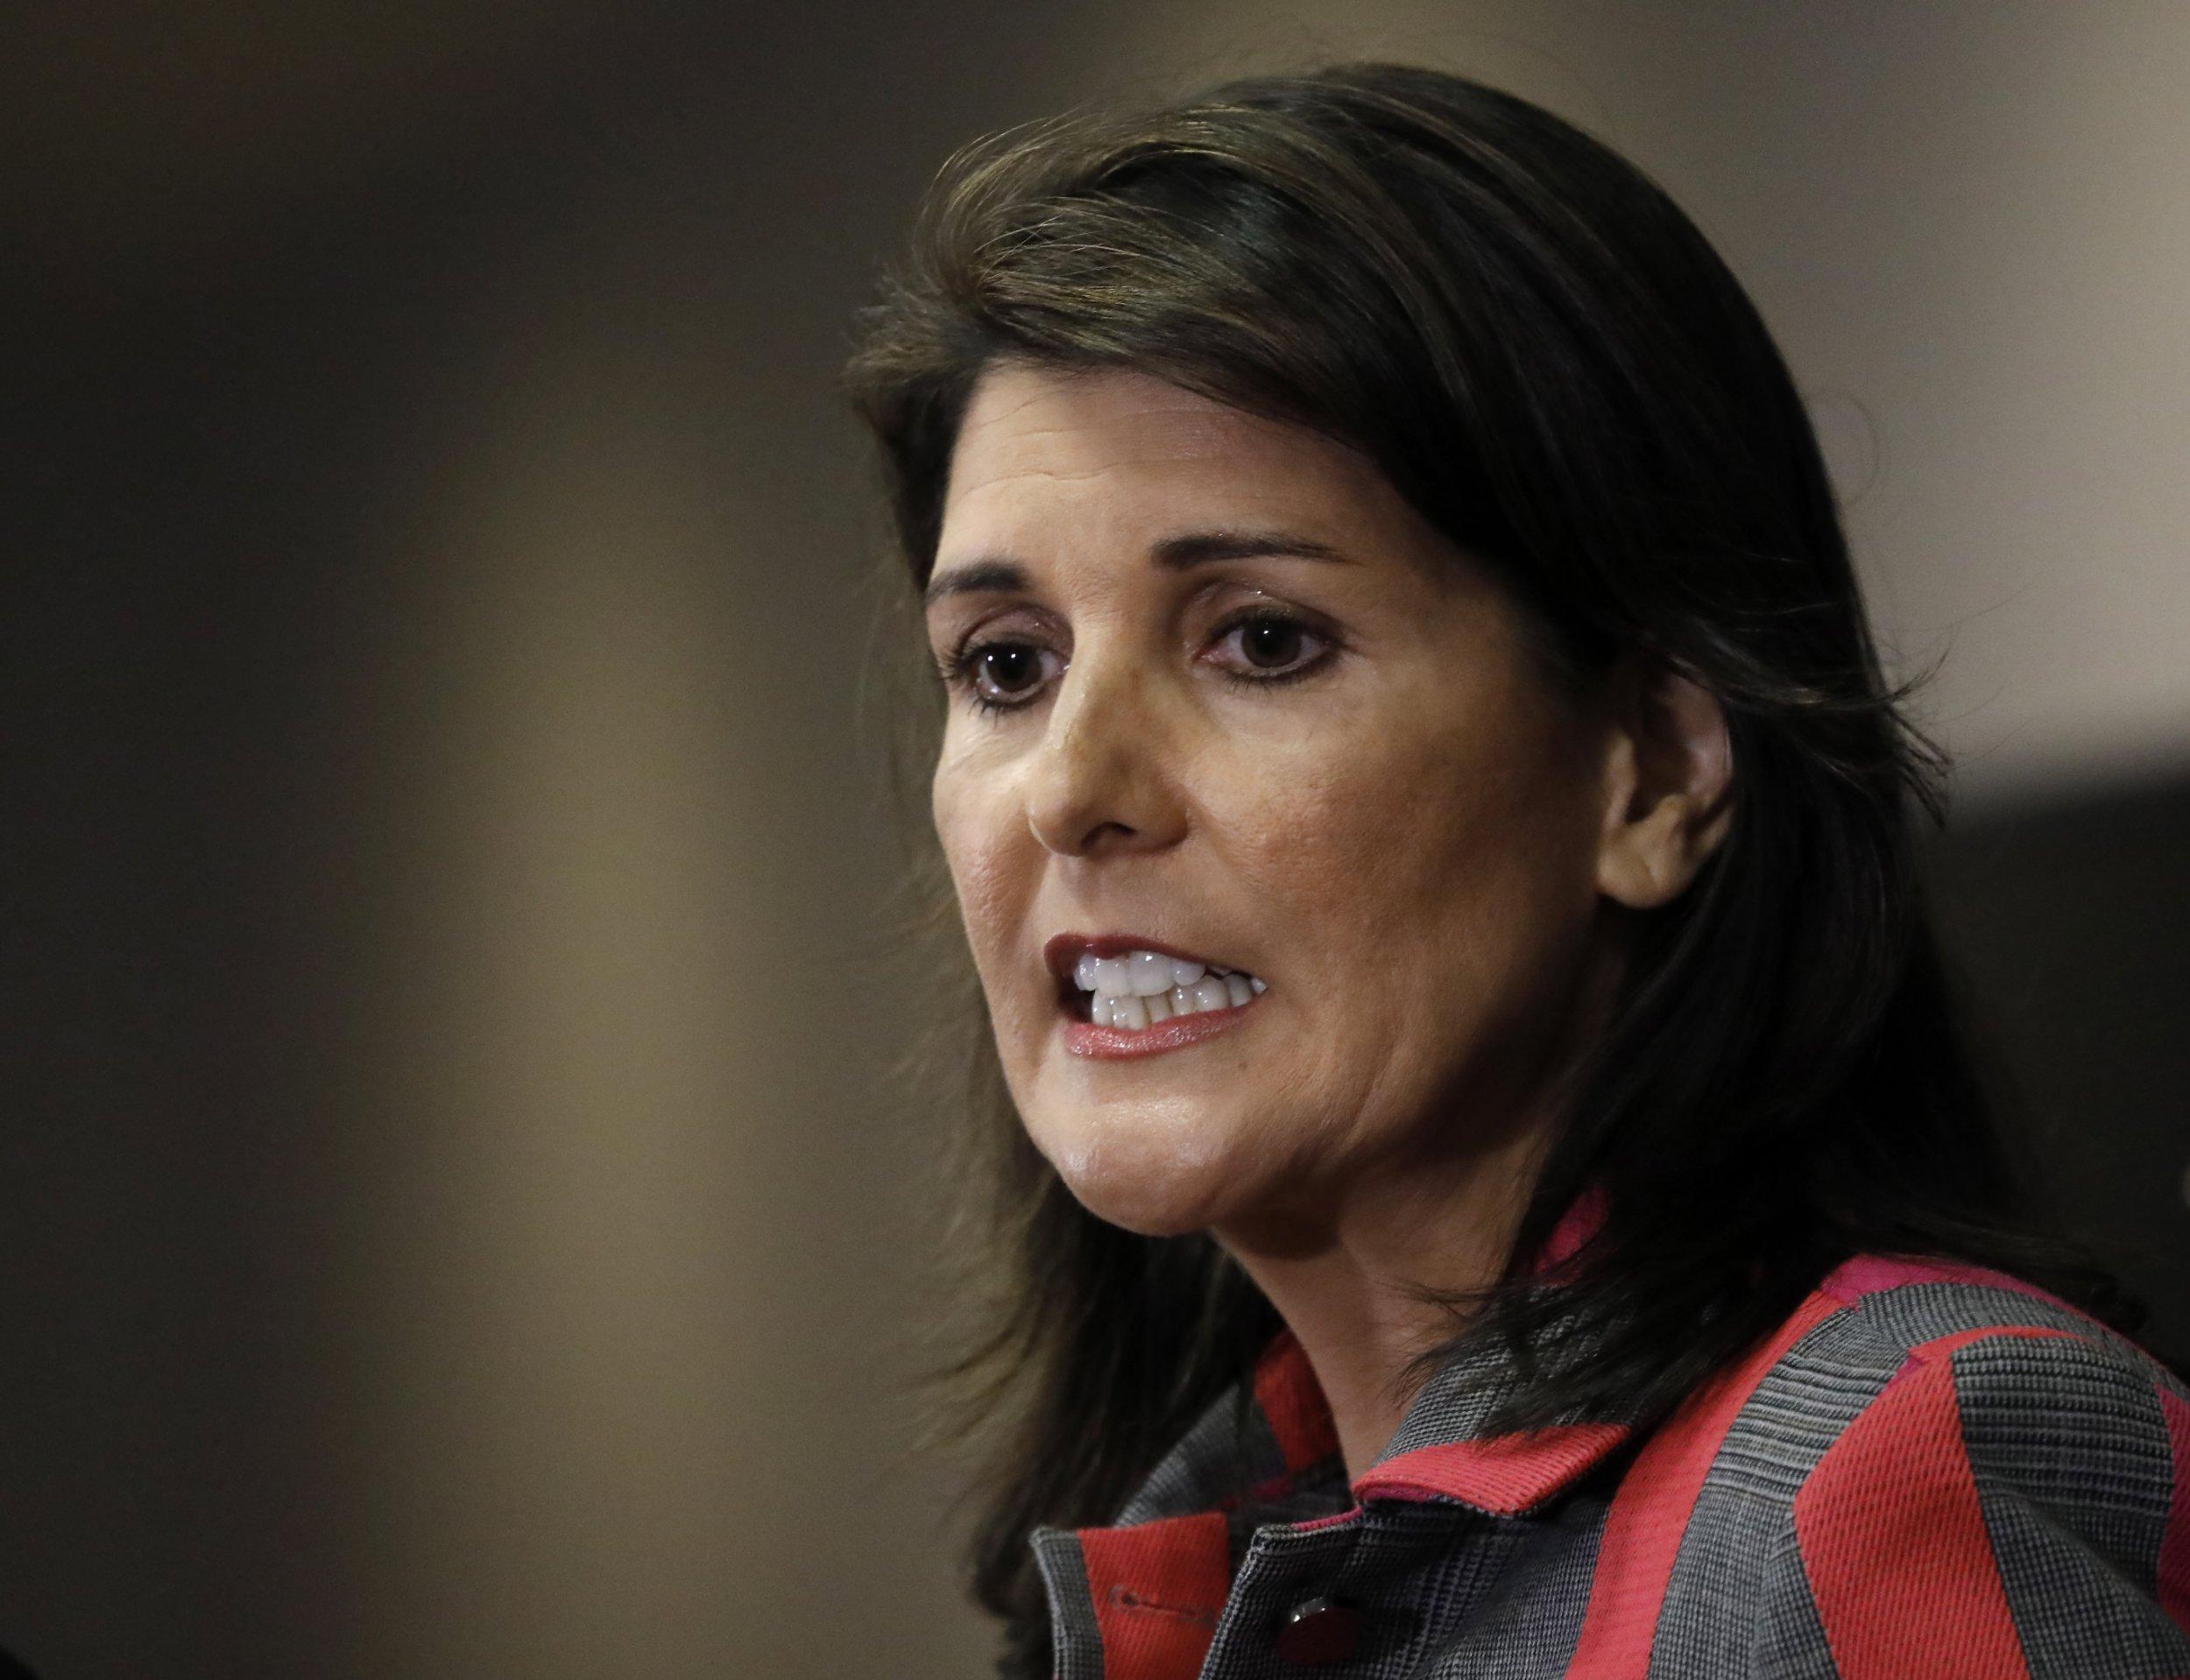 Why did Nikki Haley resign as US ambassador to UN?